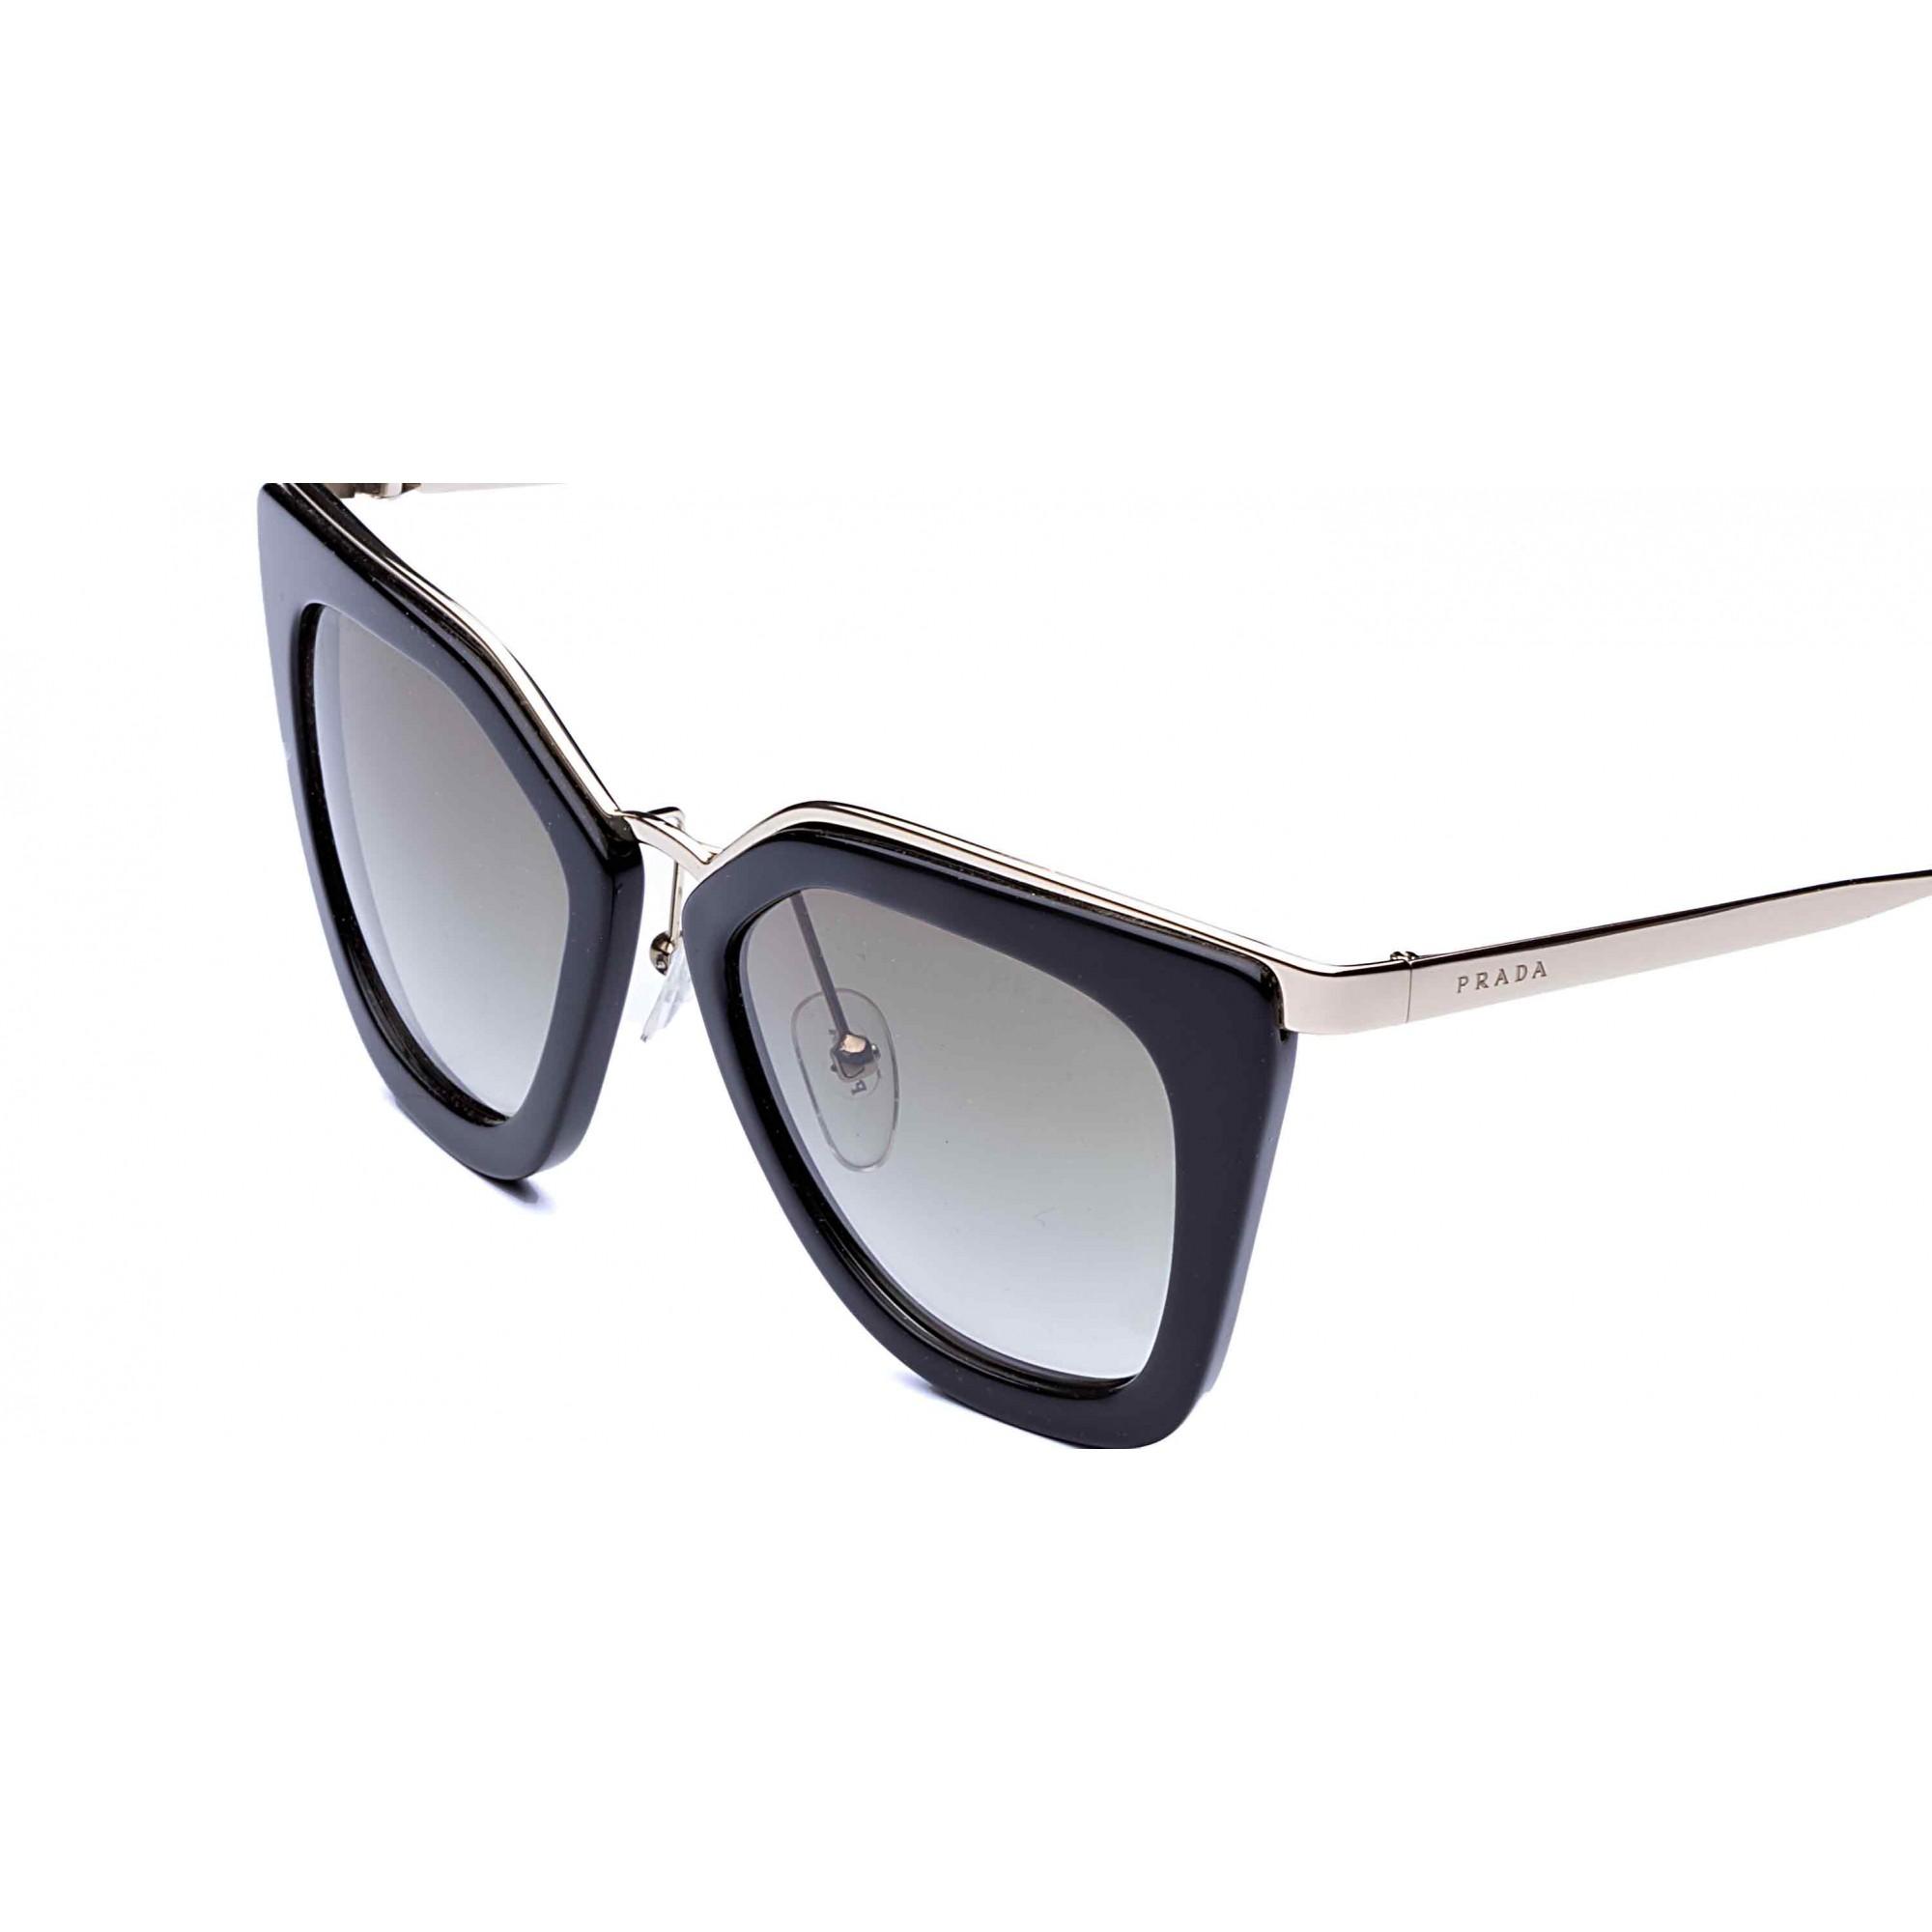 Óculos de Sol SPR53S Prada - Original